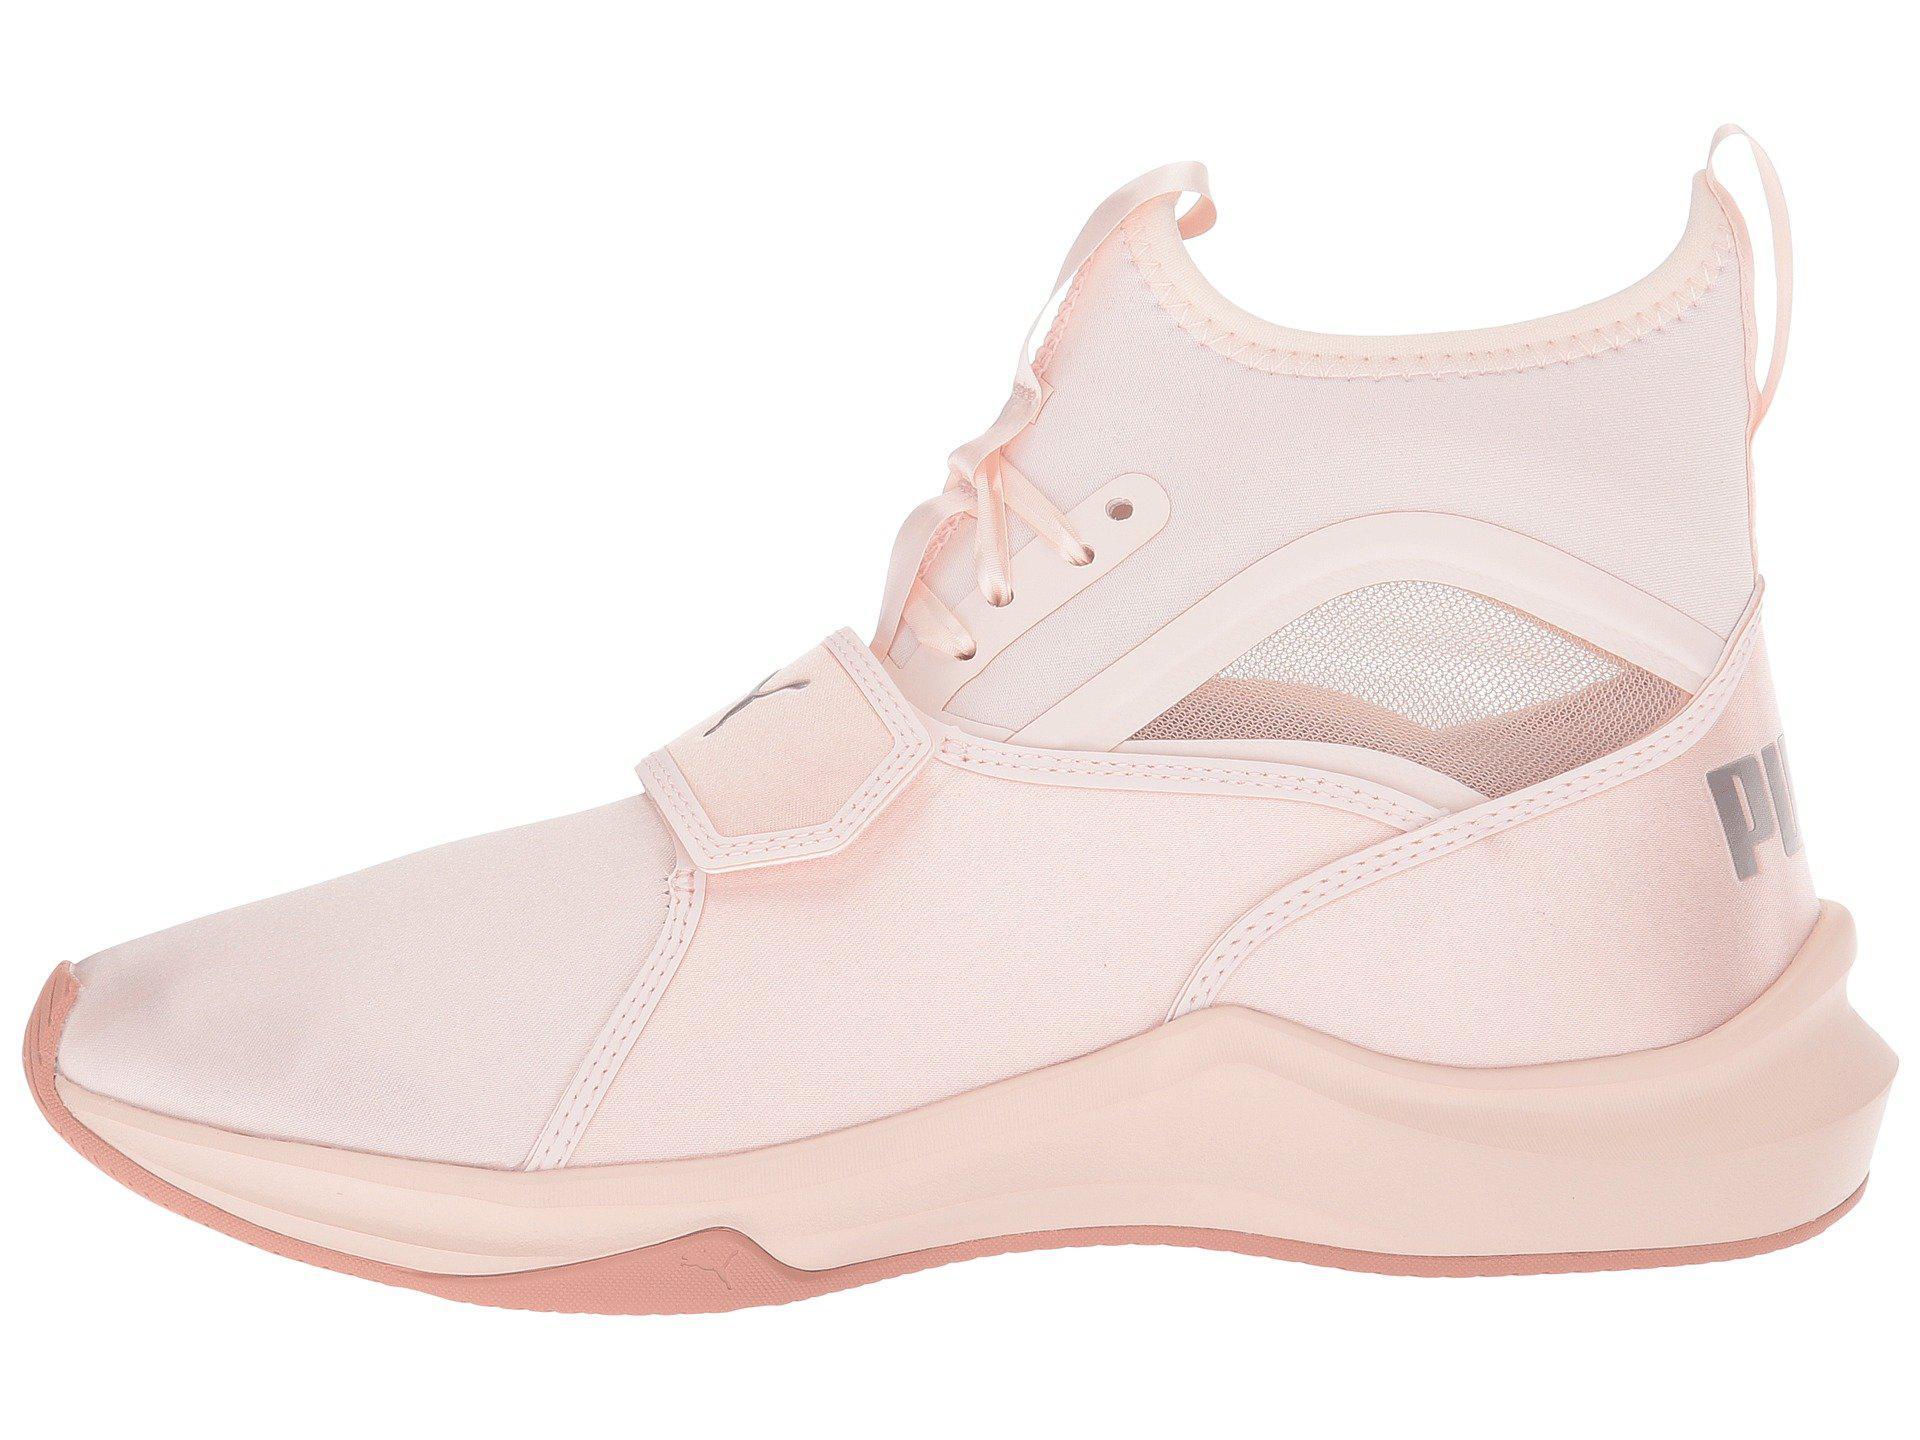 006f61daab1 Lyst - PUMA Phenom Satin Ep (pearl pearl) Women s Shoes in Pink